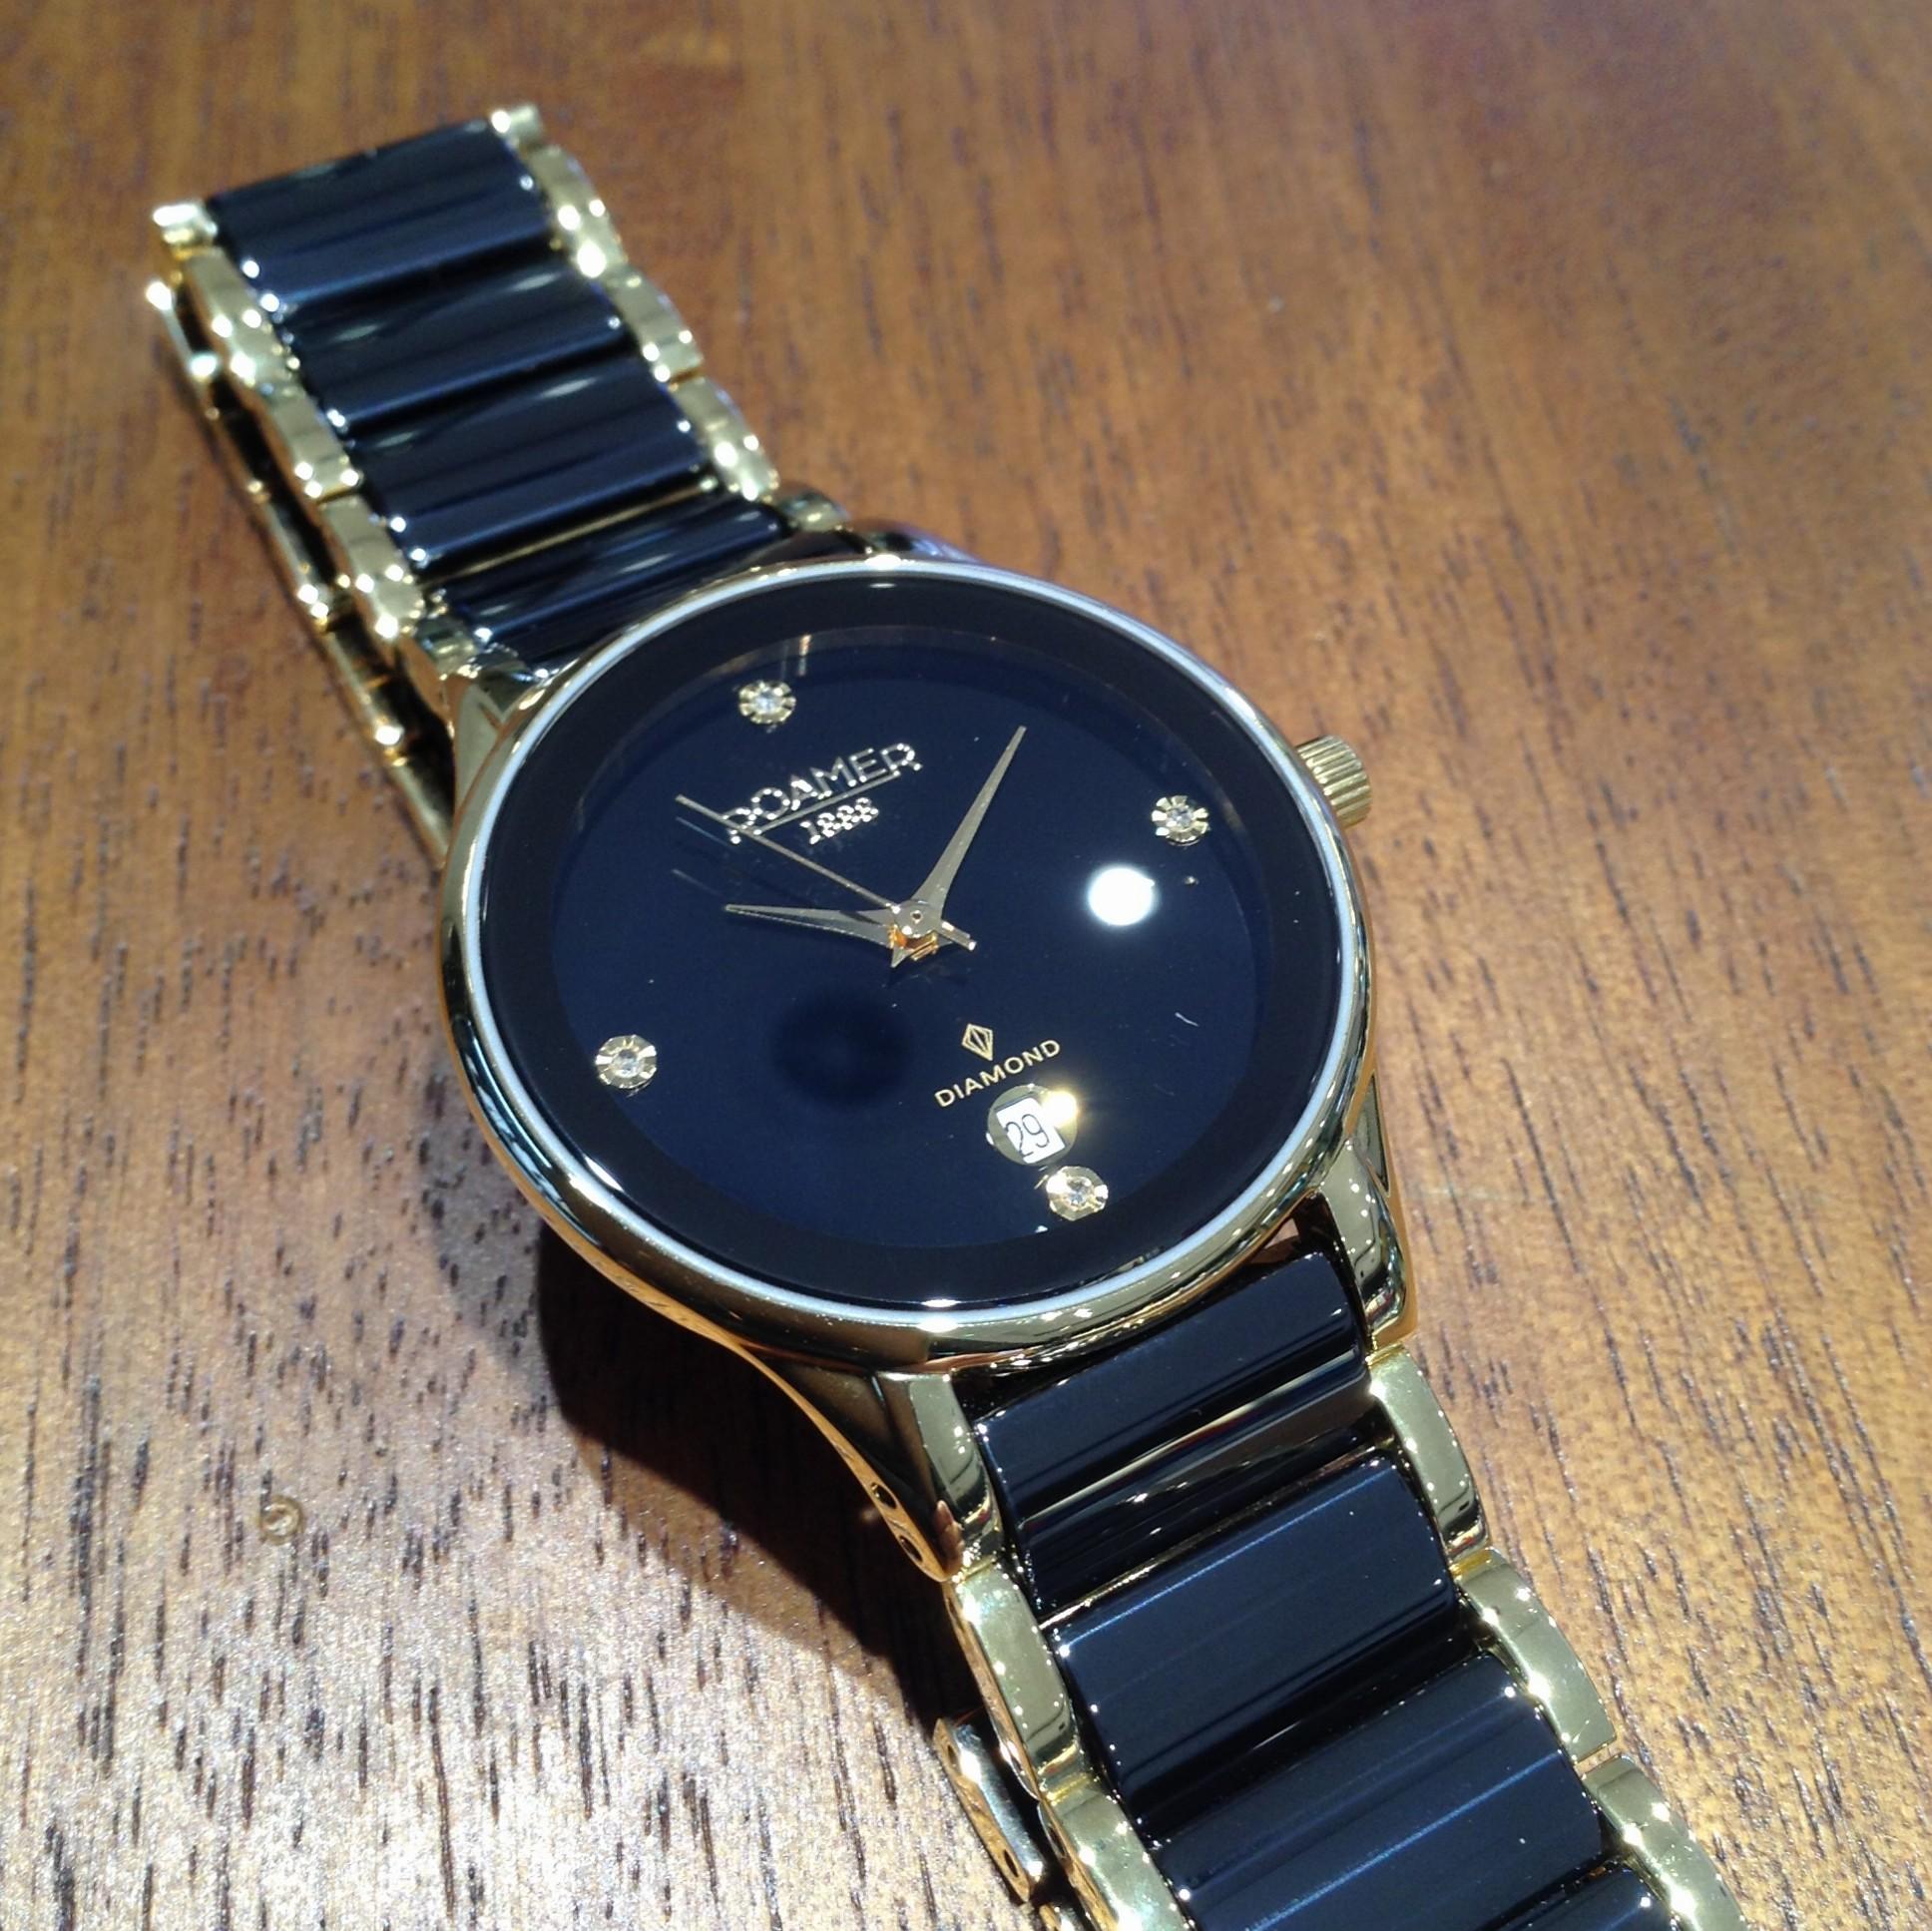 Roamer Ceraline Saphira Watch Crown Jewellery